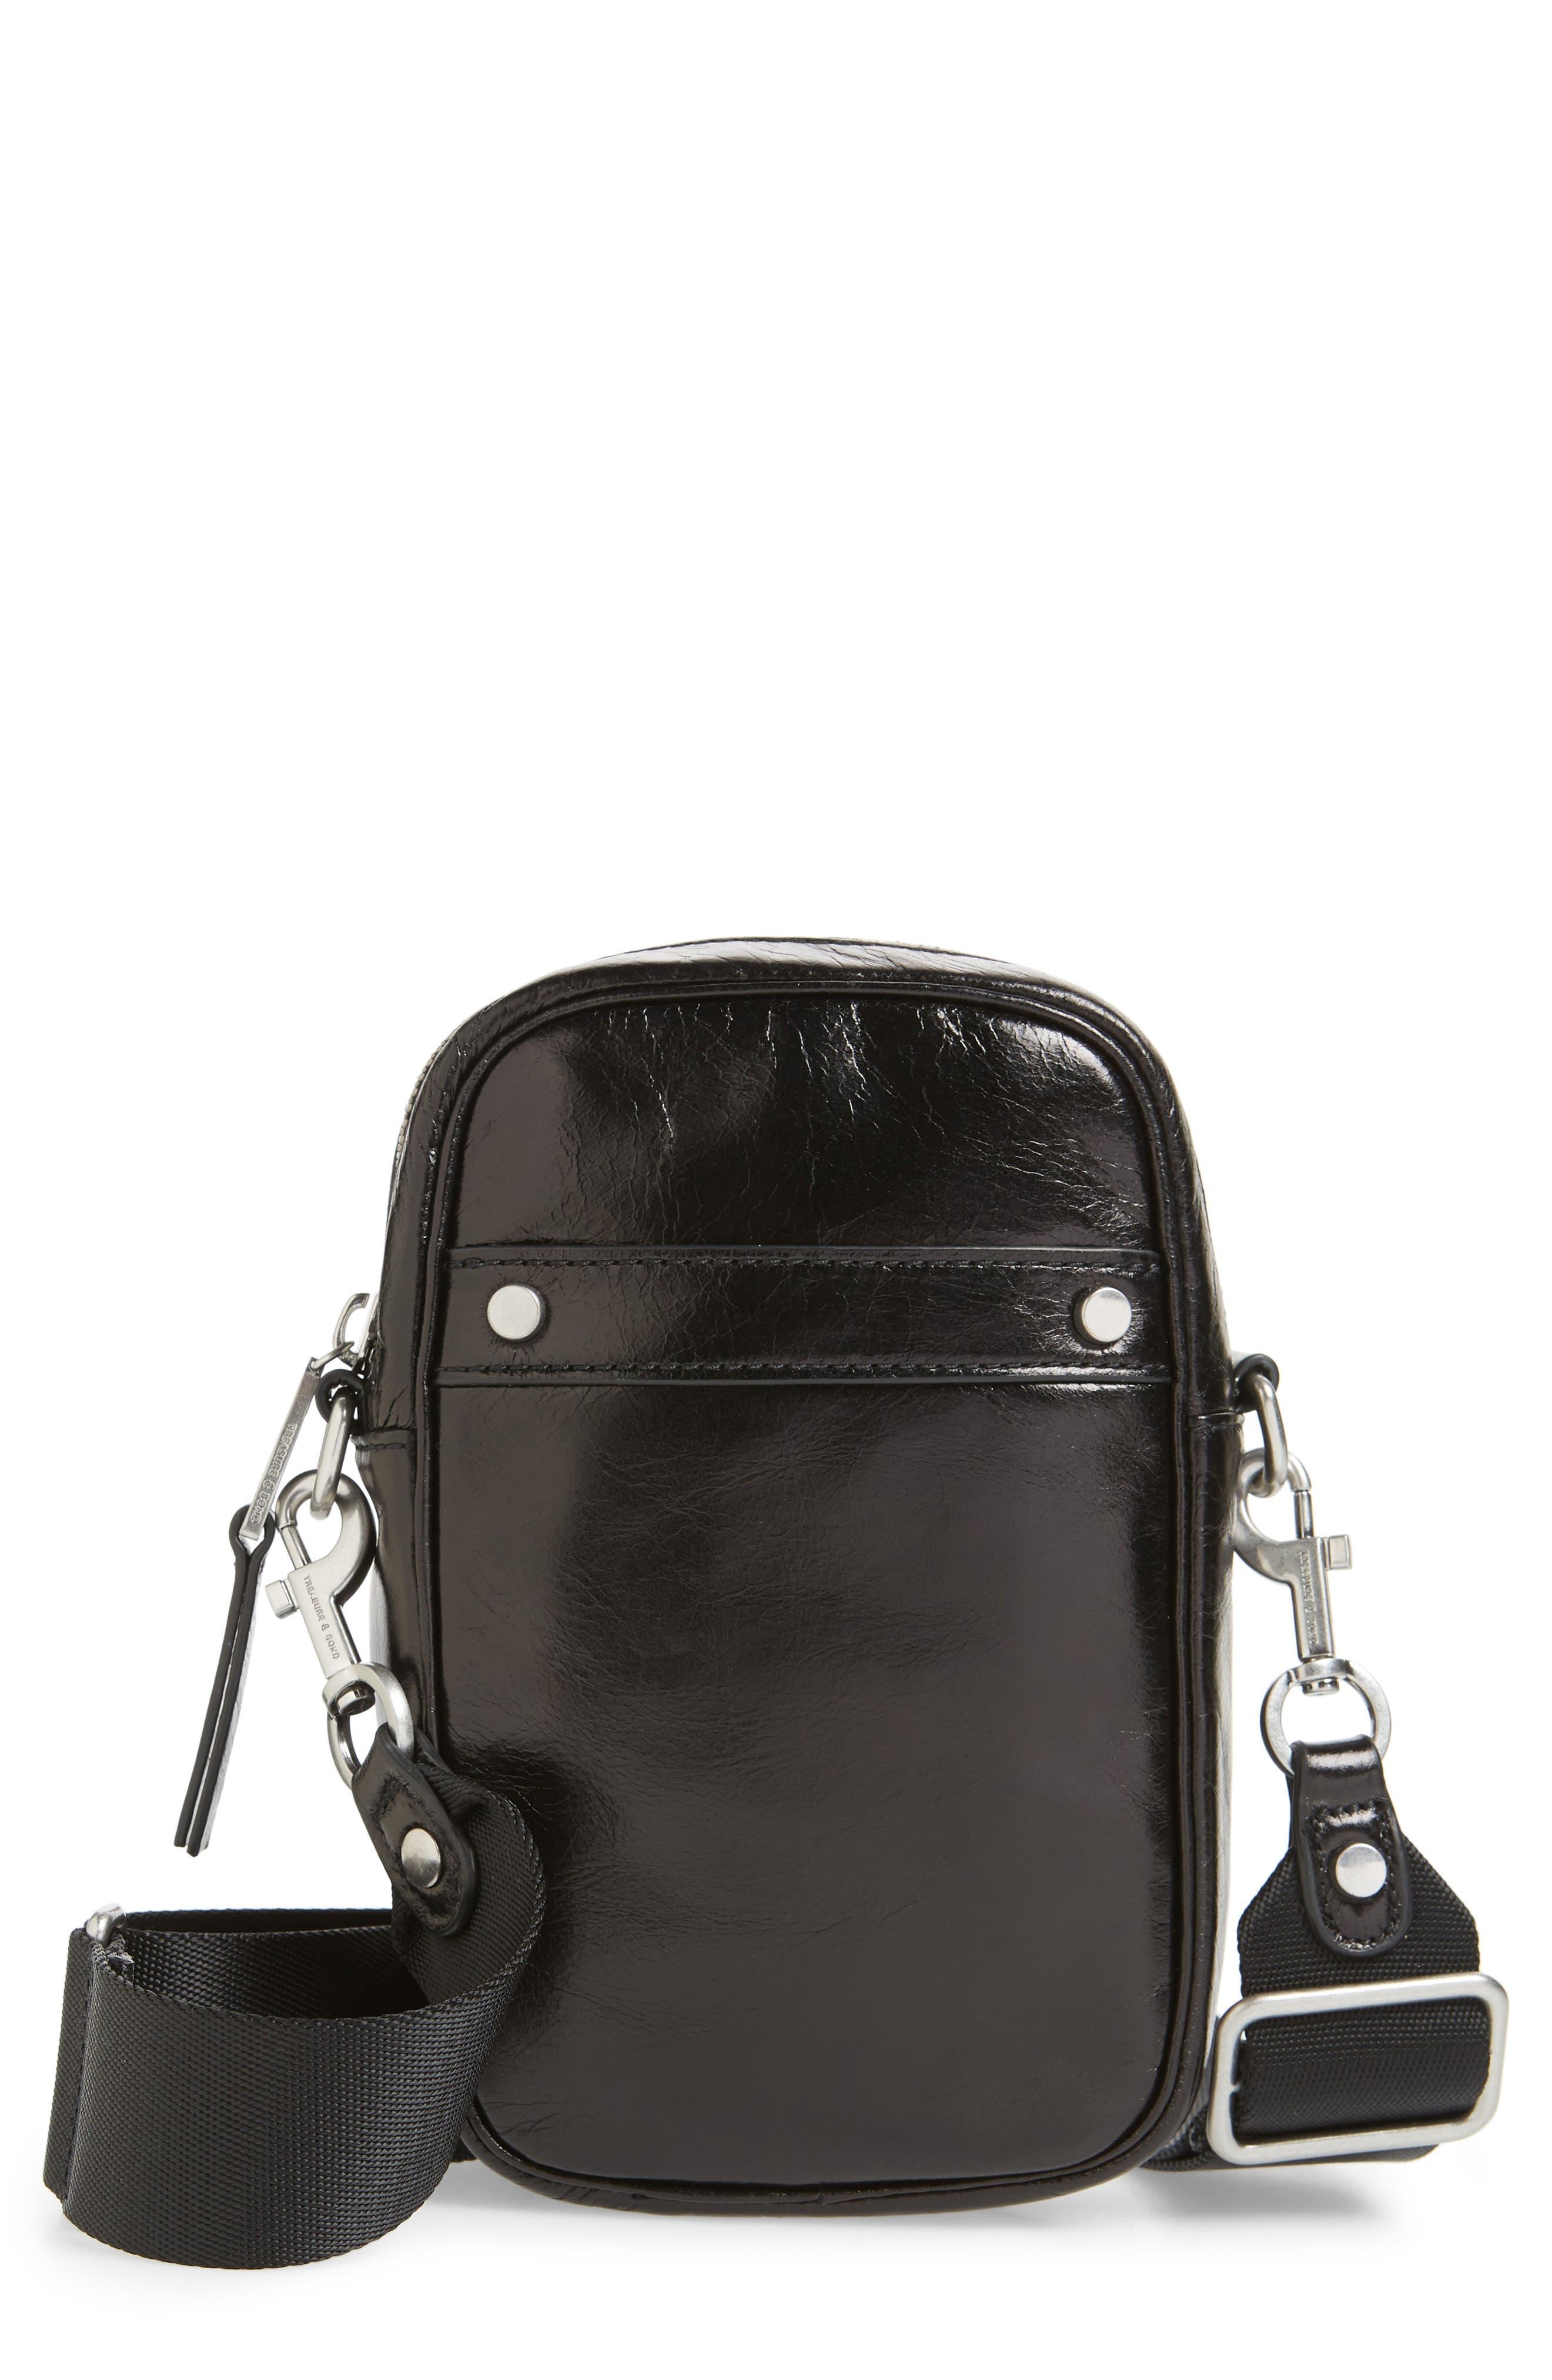 eb56496fa4cc Women's Treasure & Bond Handbags | Nordstrom